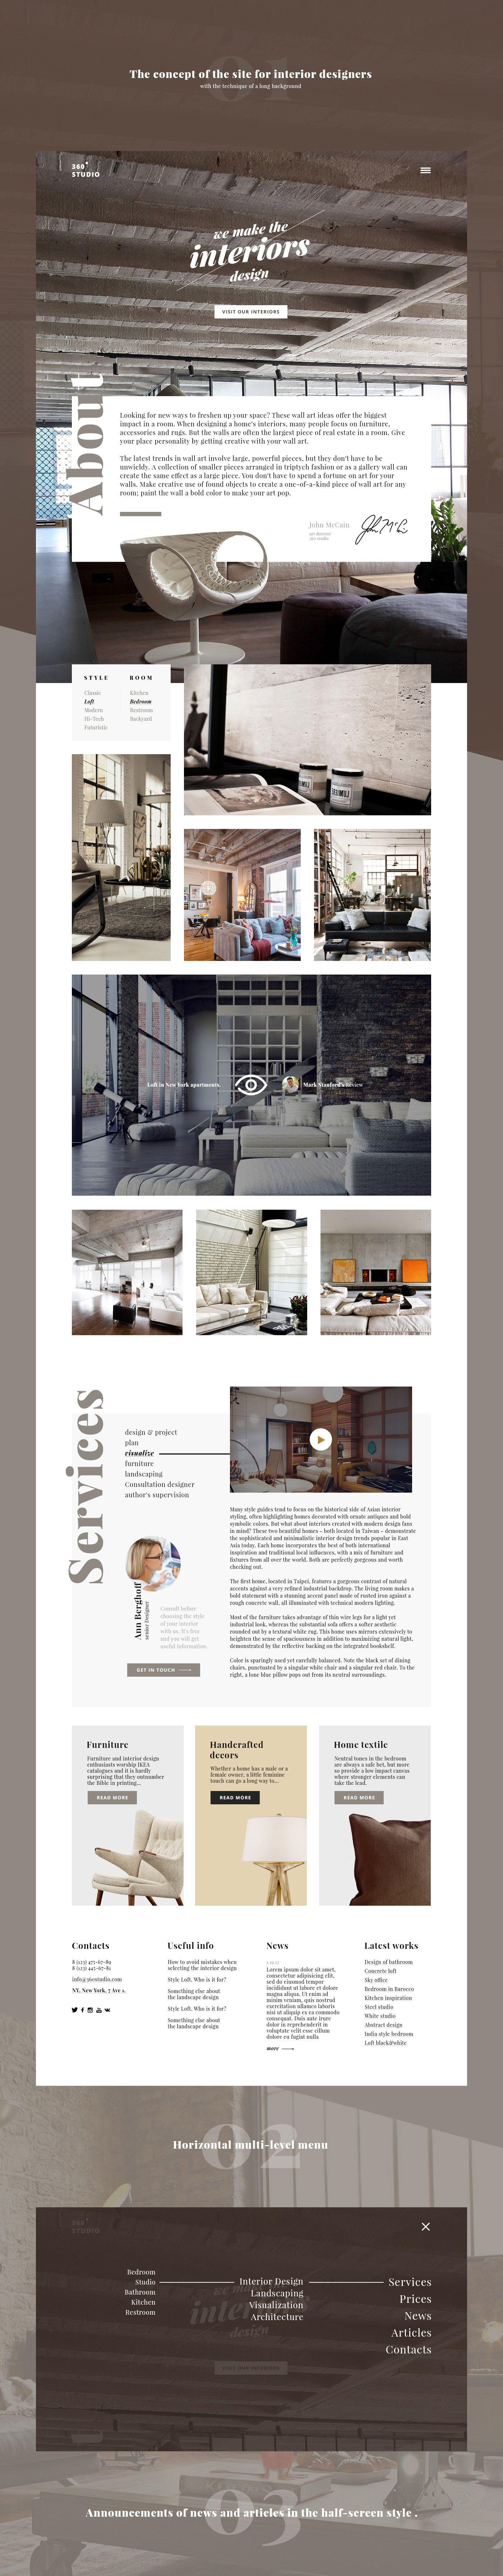 Website Concept For Interior Design